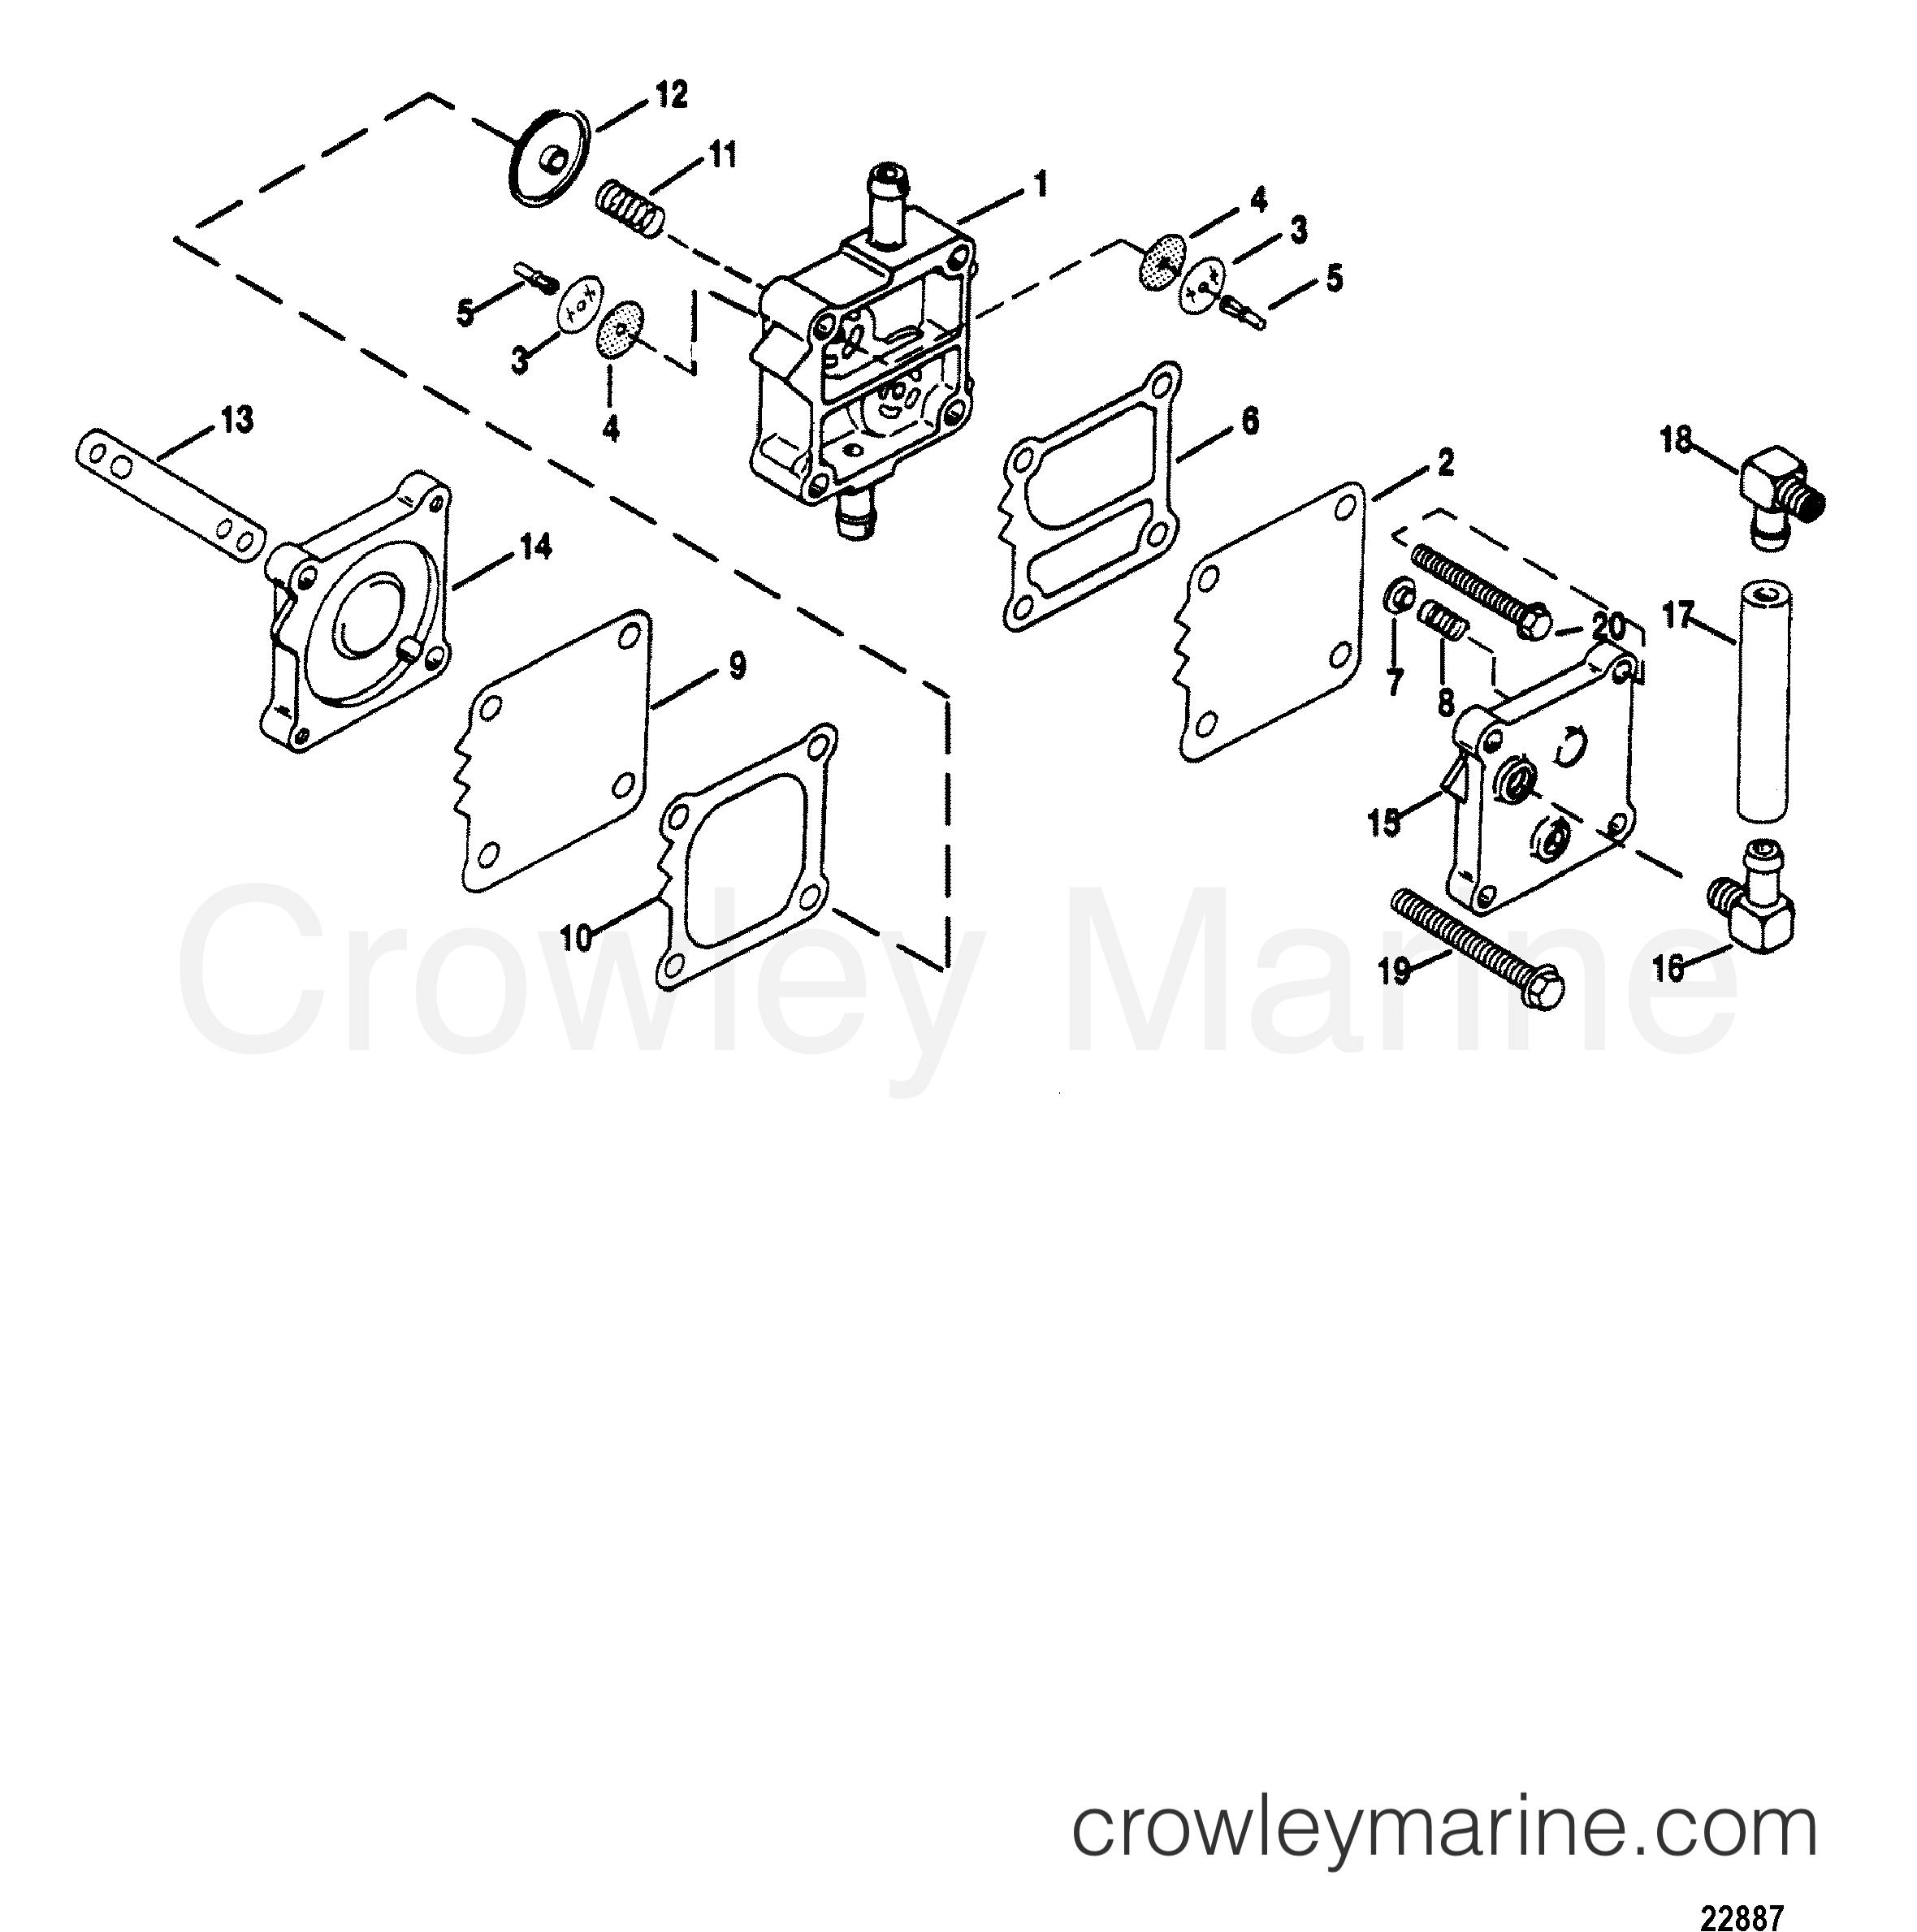 1993 Mariner Outboard 200 [CXL] - 7200425BD FUEL PUMP section